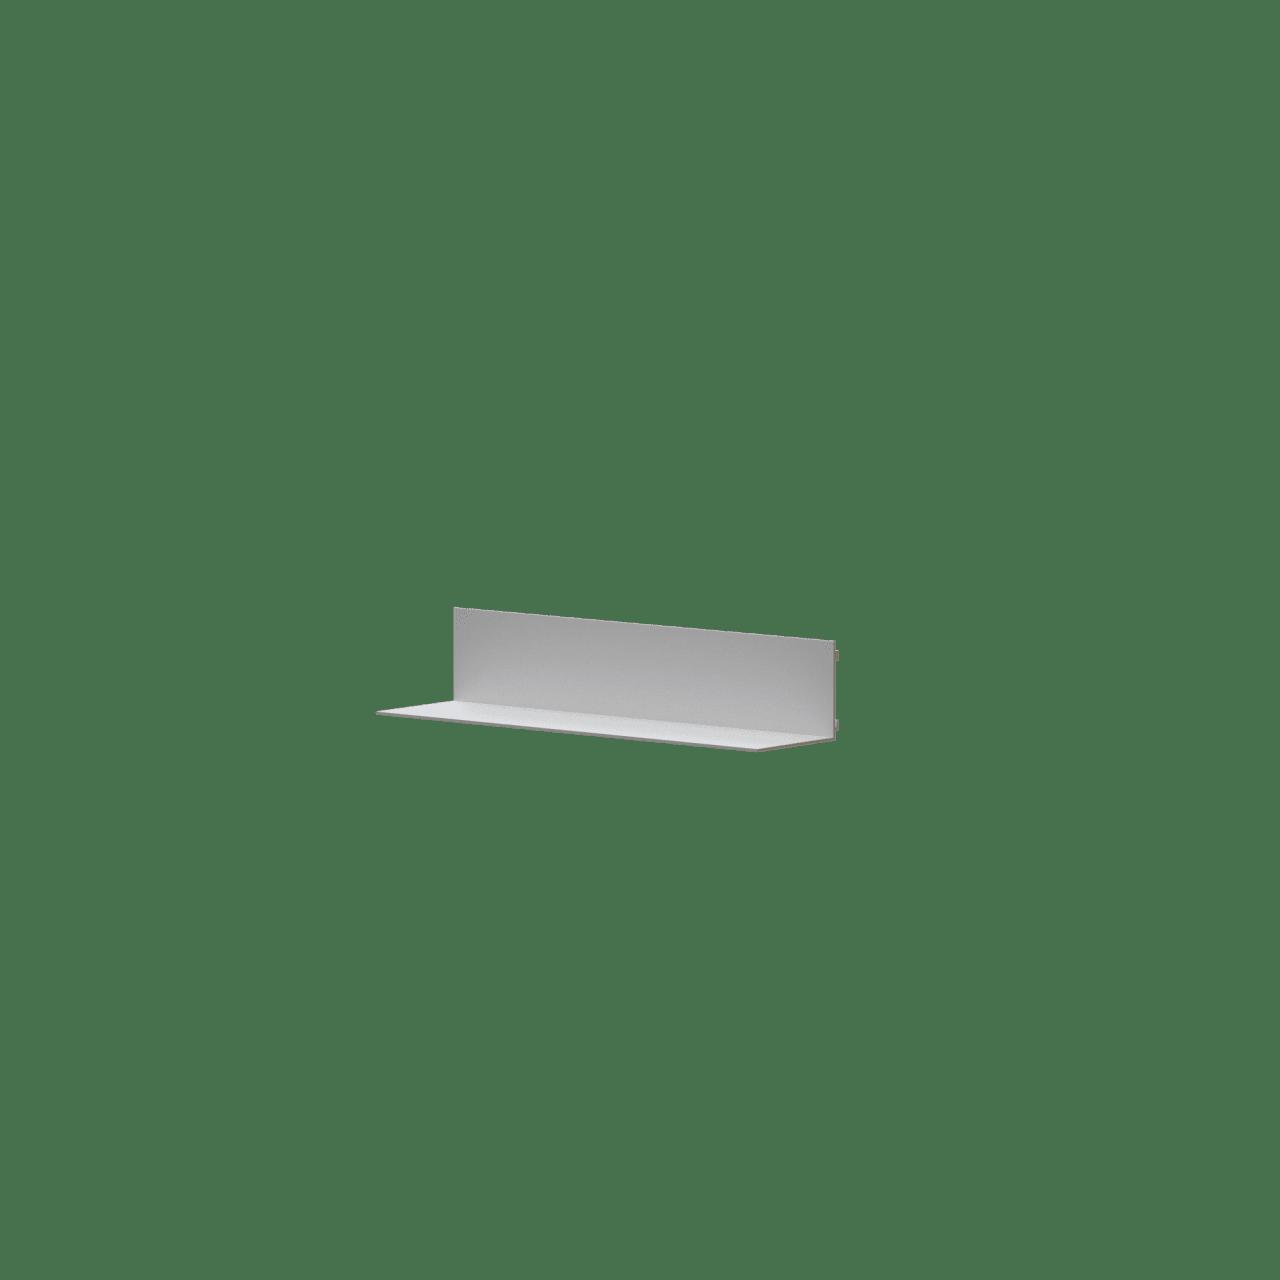 SH06 Profil Regal